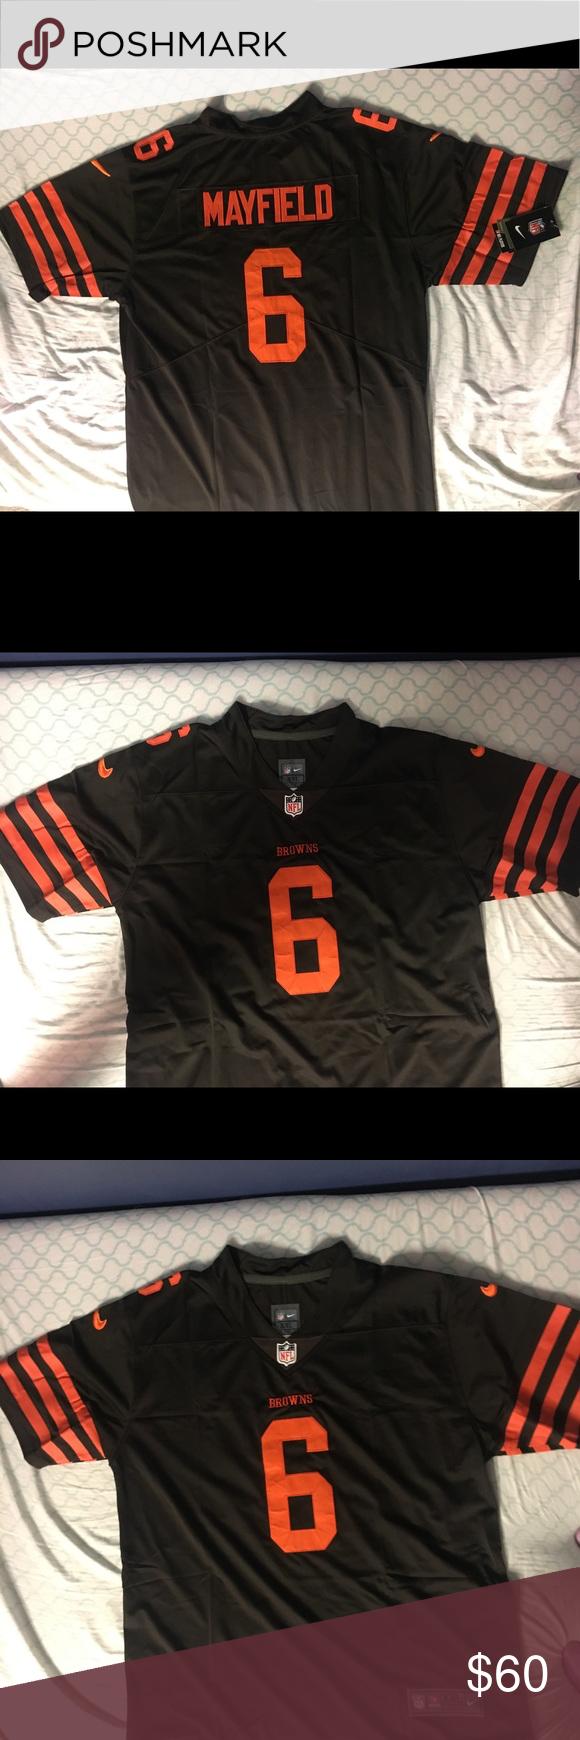 hot sale online b287d 926fb Baker Mayfield Browns jersey Baker Mayfield jersey size XXL ...